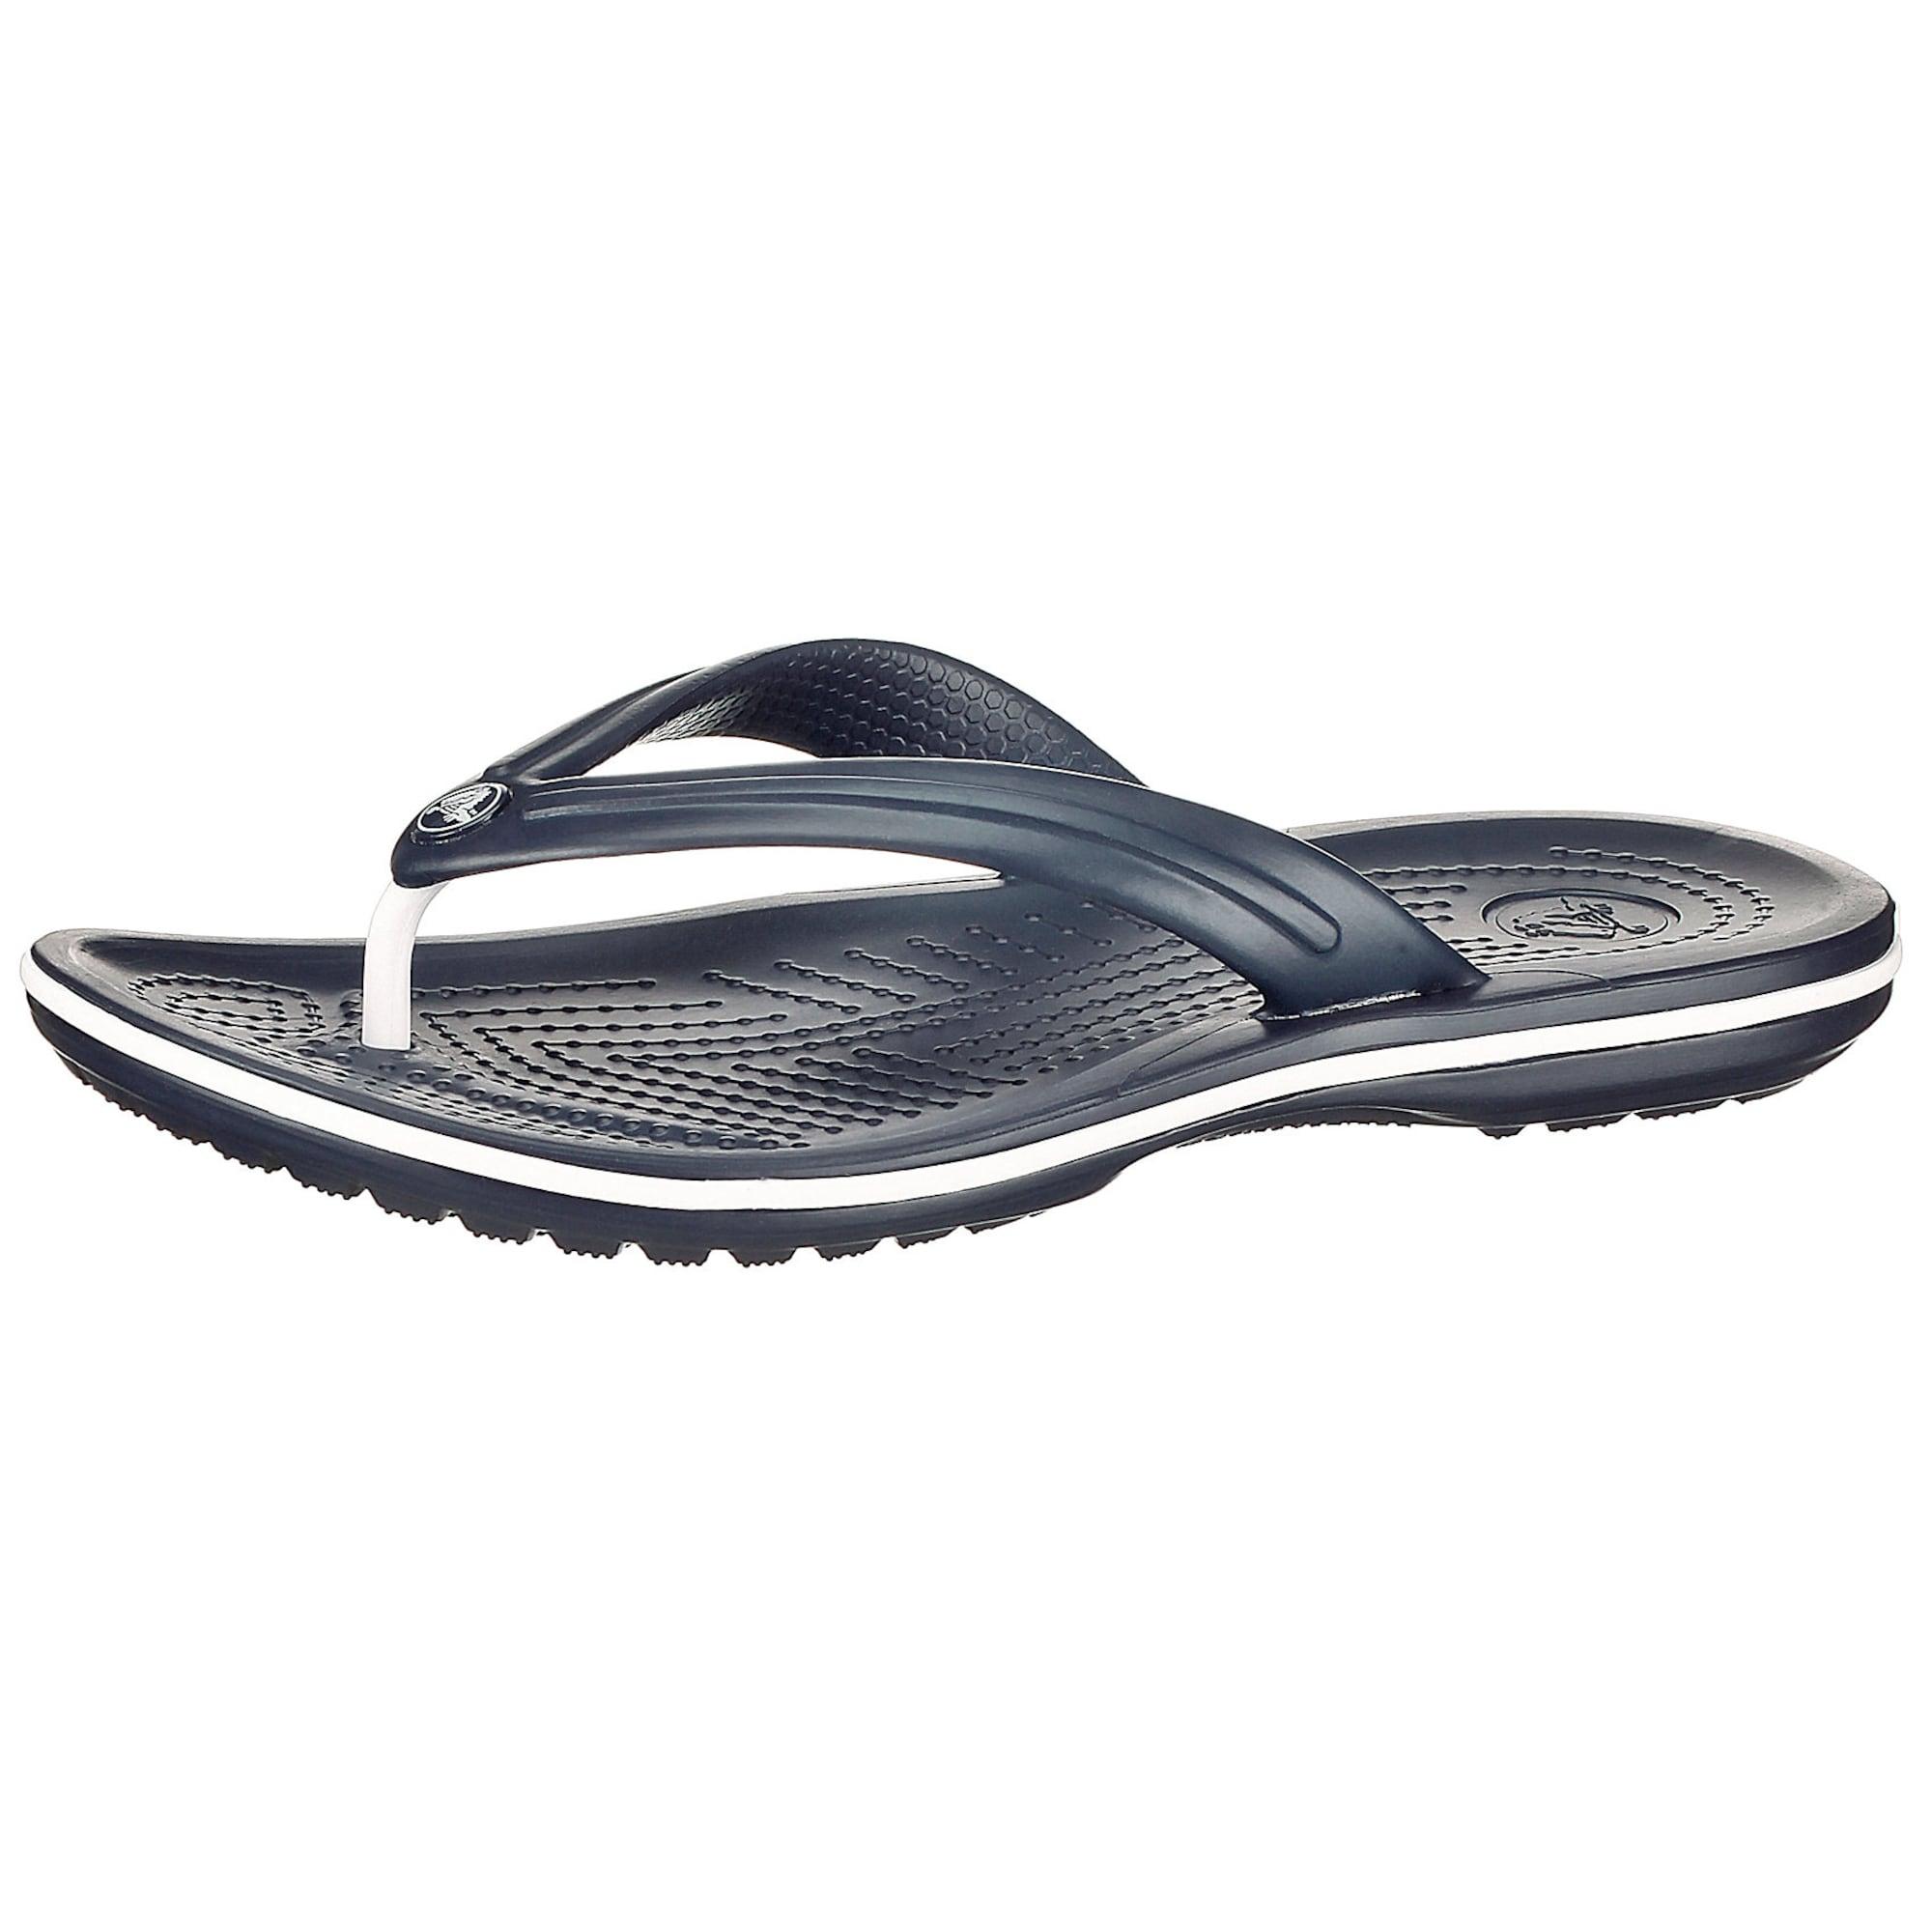 Žabky Flip tmavě modrá Crocs